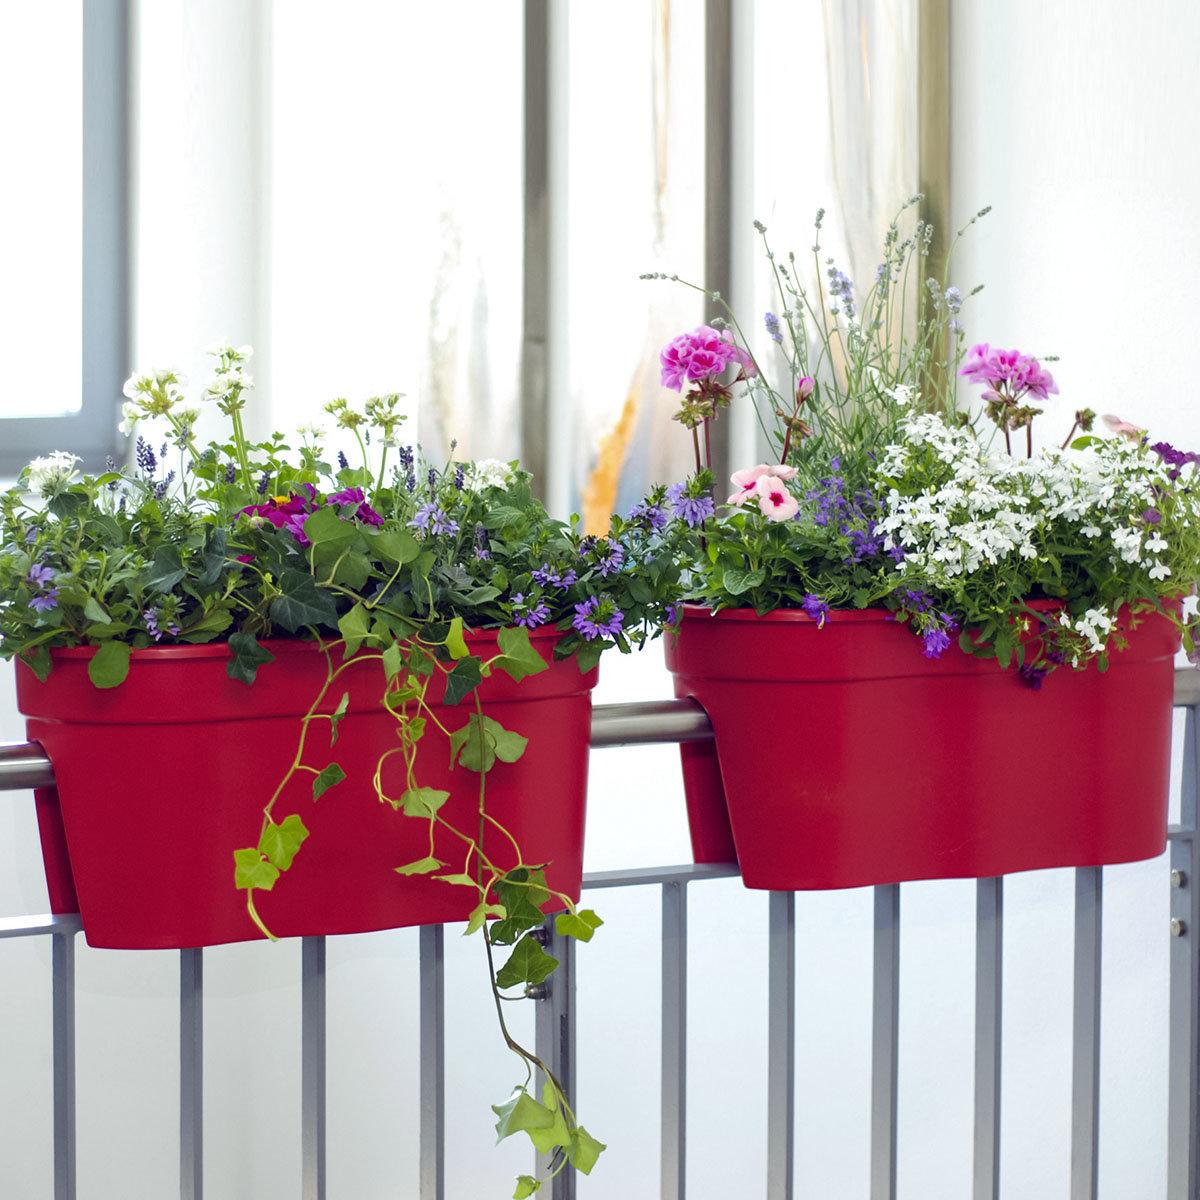 Geländertopf Flowerclip, 57,5 x 27,7 x 27 cm, rot | #2